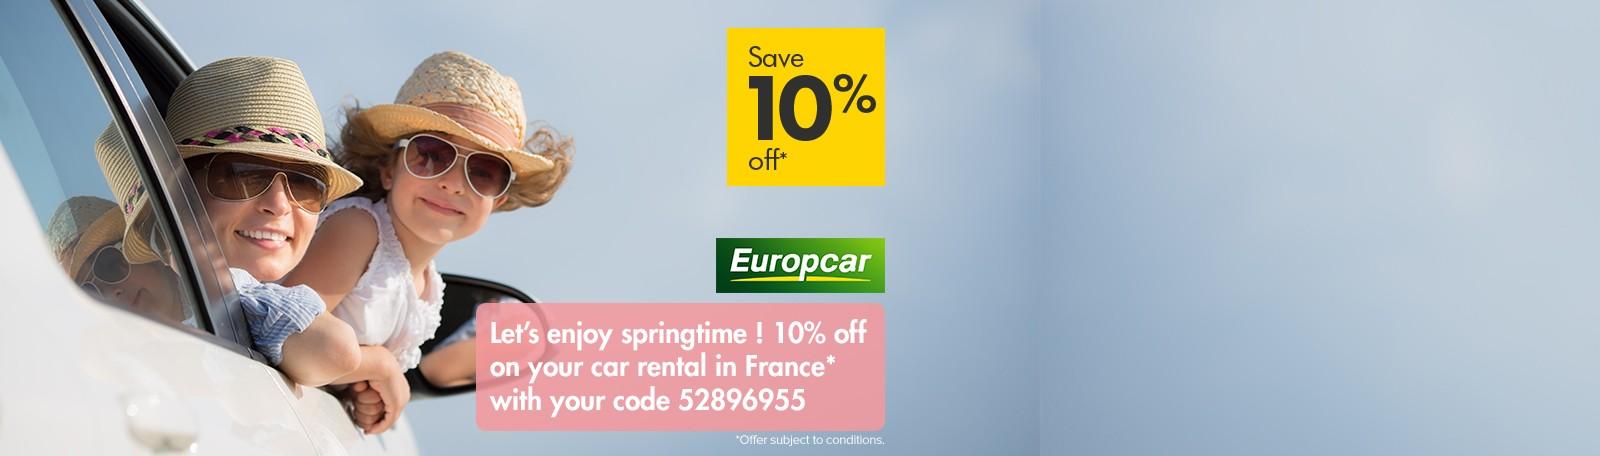 2019 Europcar offer